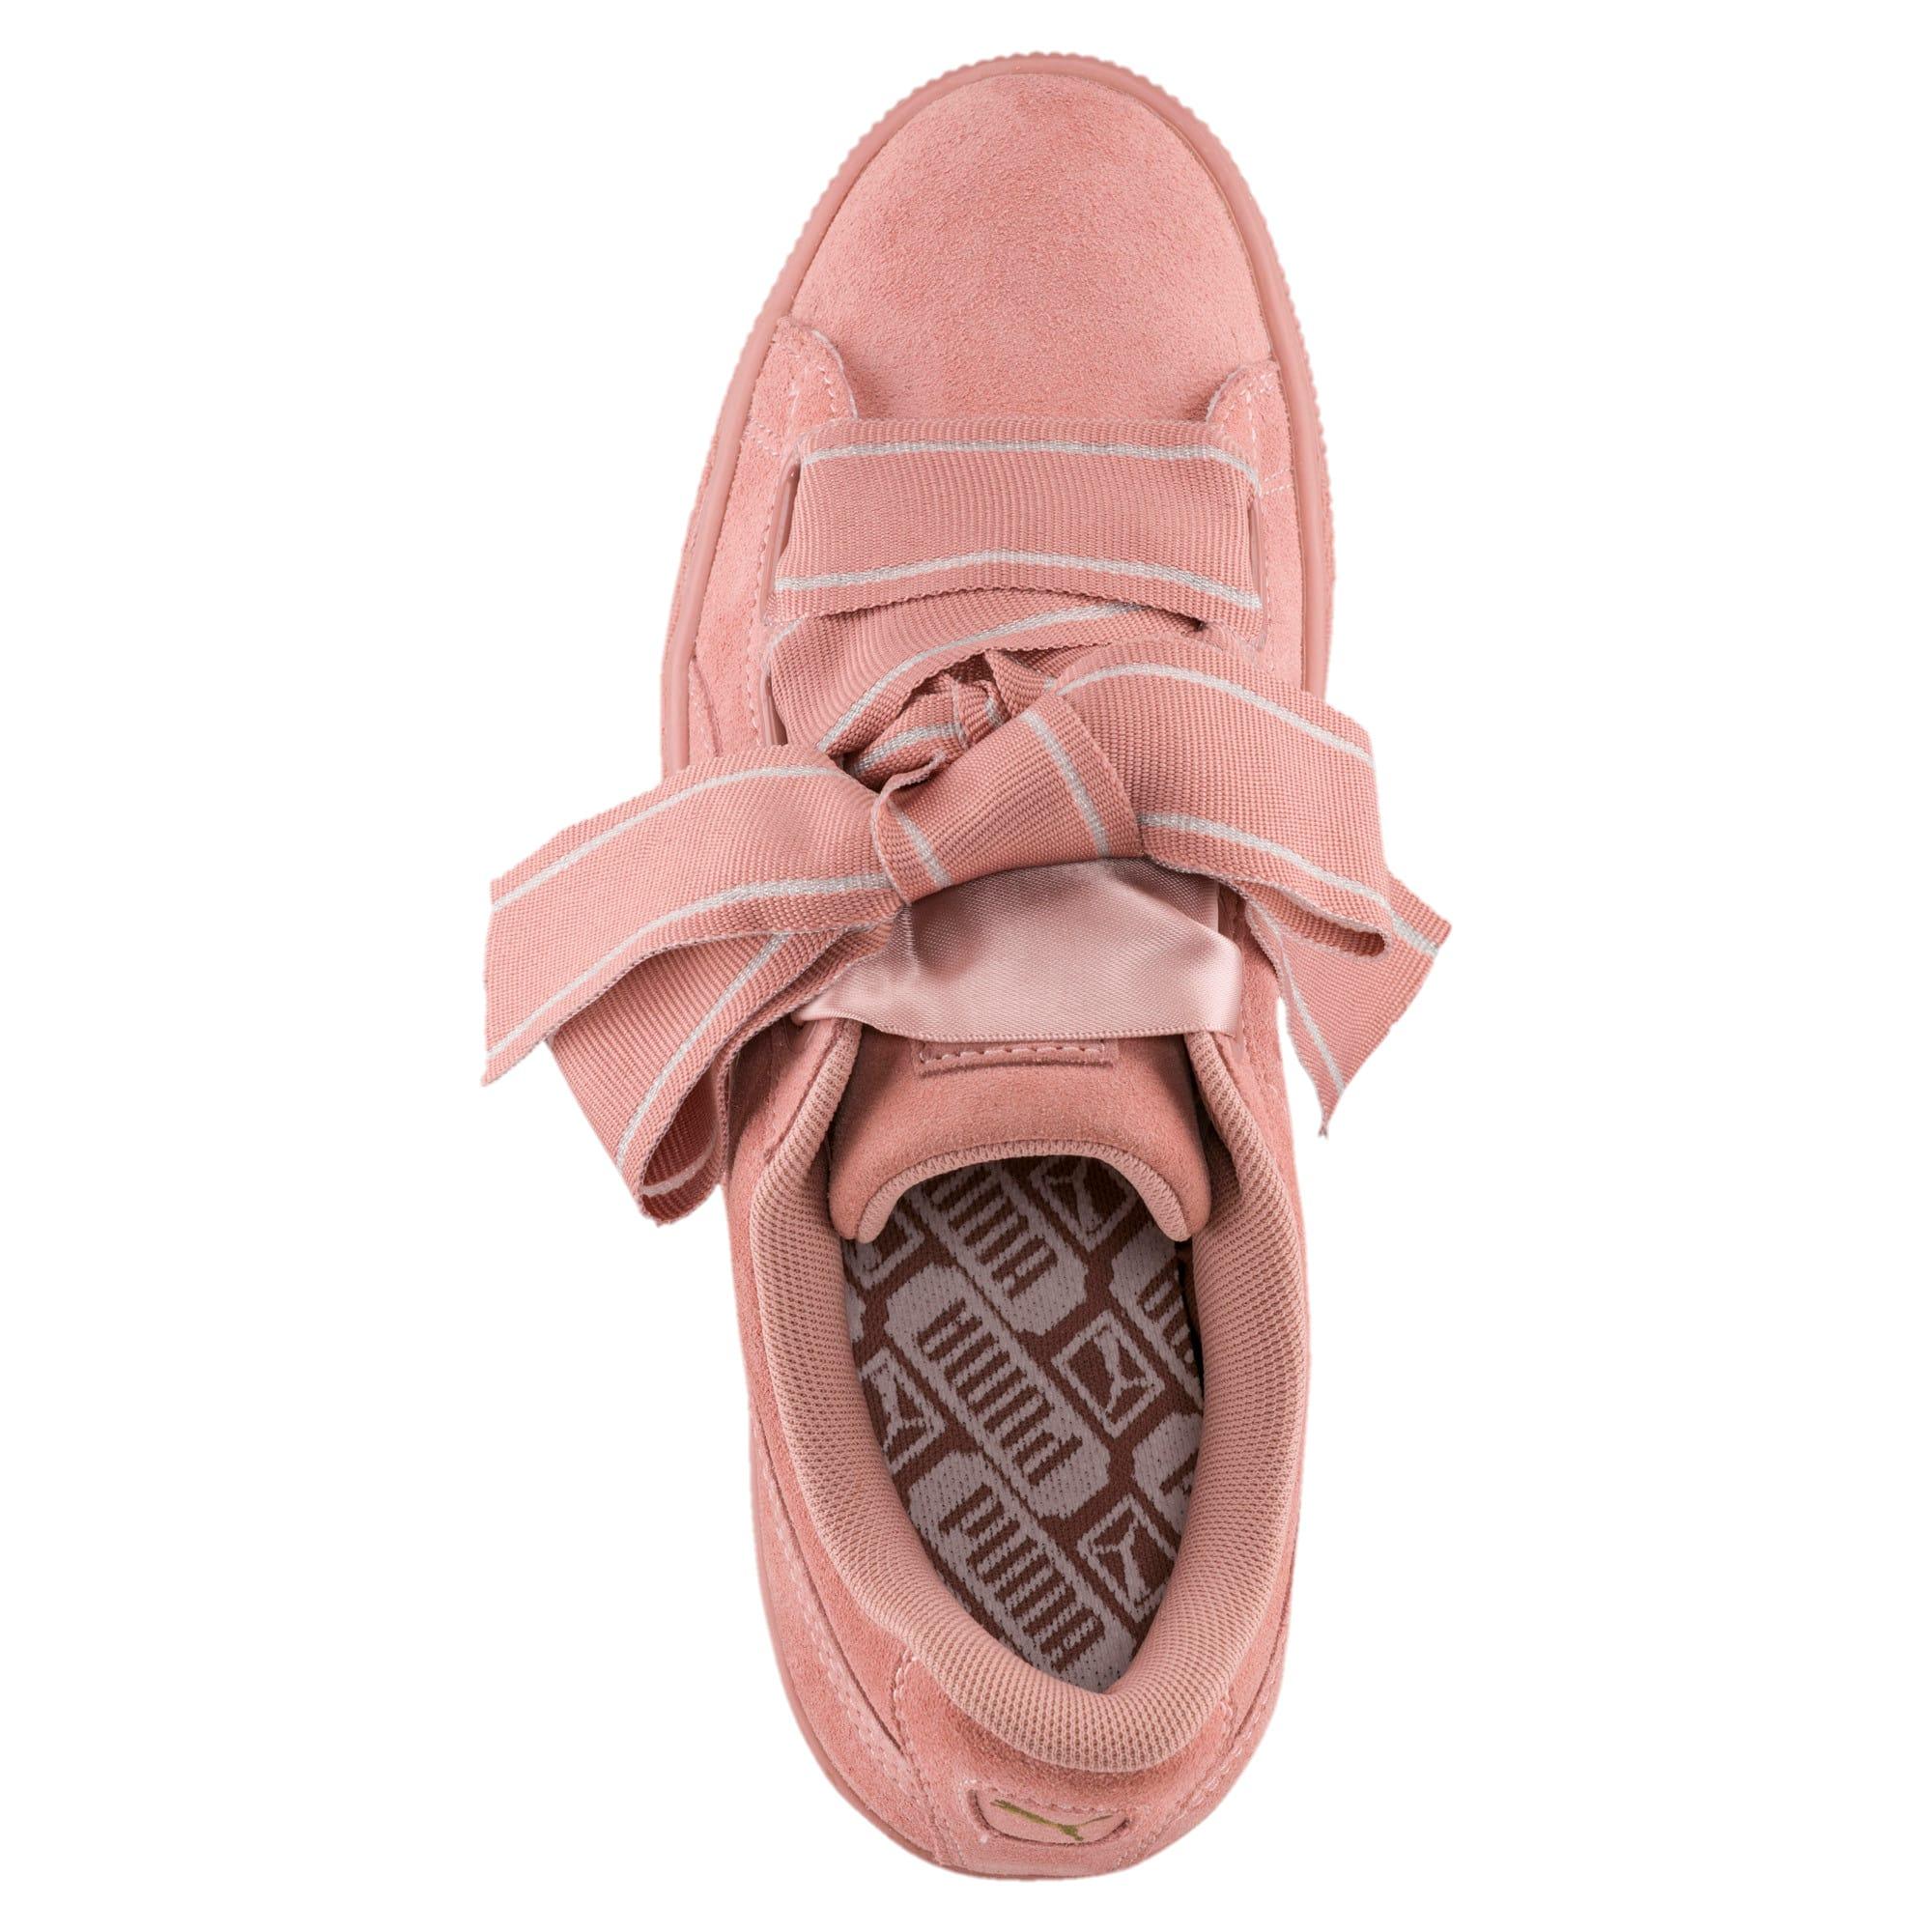 Thumbnail 5 of Suede Heart Satin II Women's Sneakers, Cameo Brown-Cameo Brown, medium